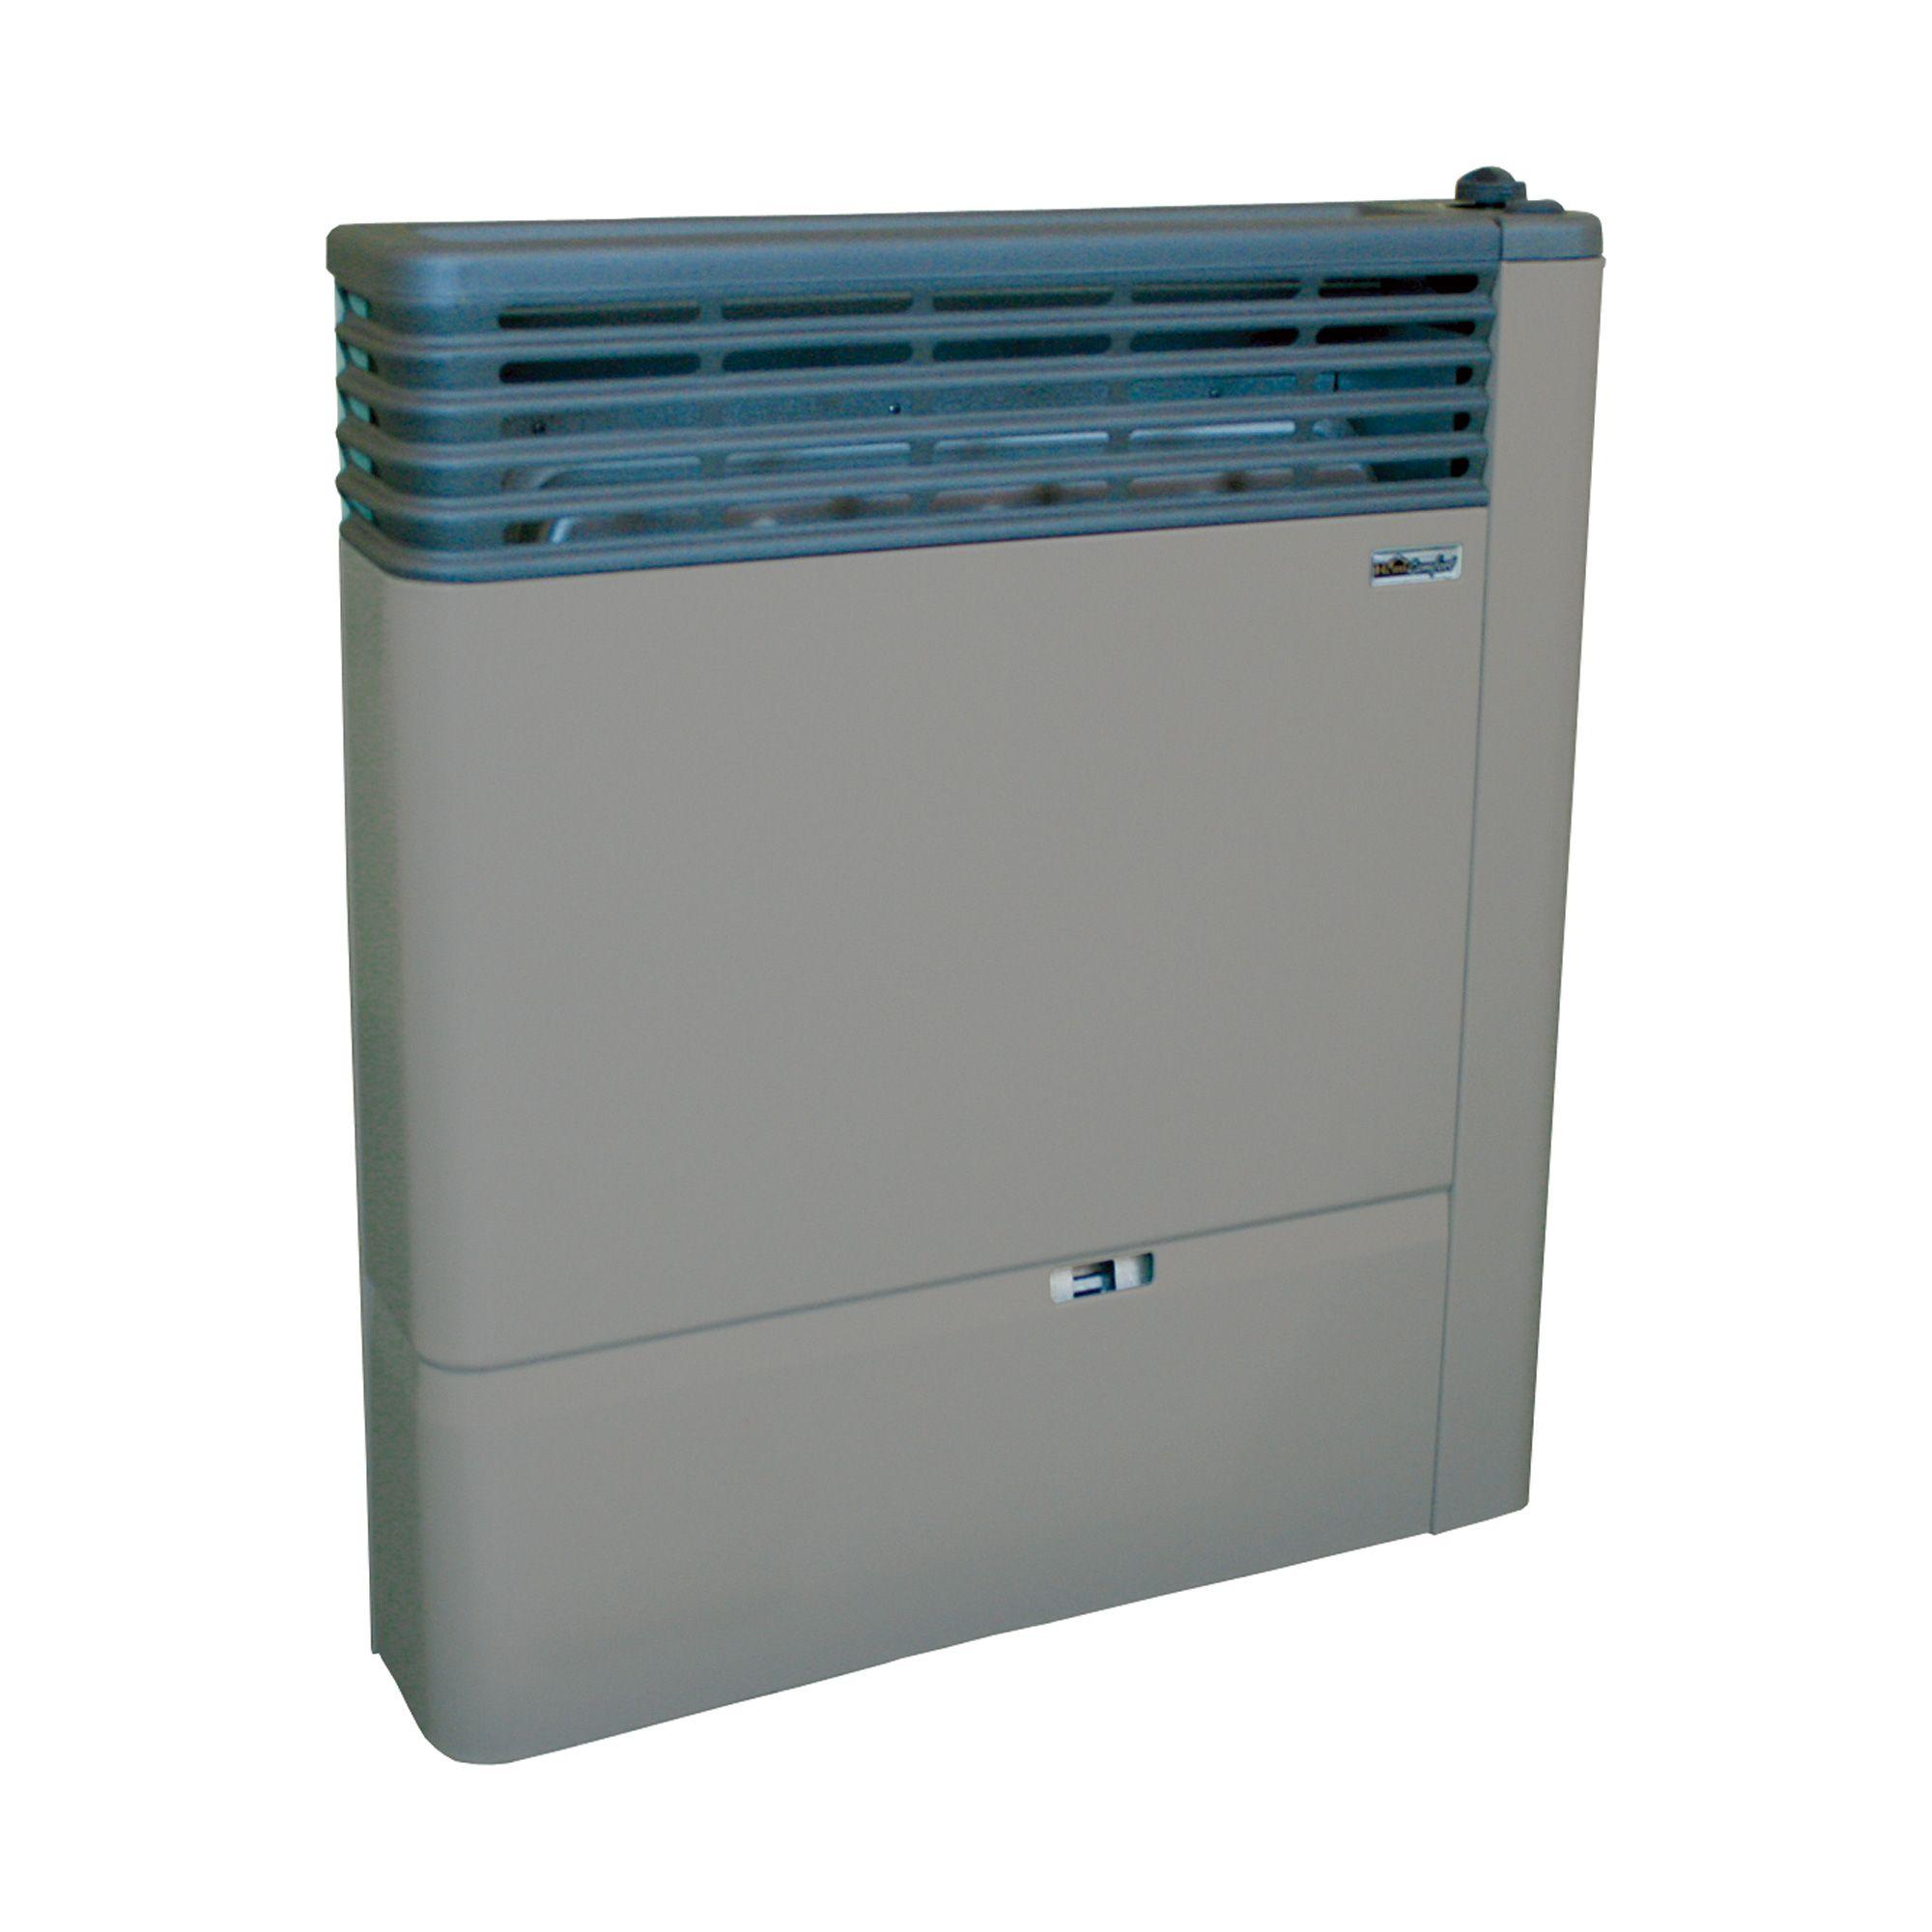 United States Stove Company Direct Vent Heater Propane 13 000 Btu Model Dv14l Propane Wall Heaters Northern Heater Propane Heater Heating And Plumbing